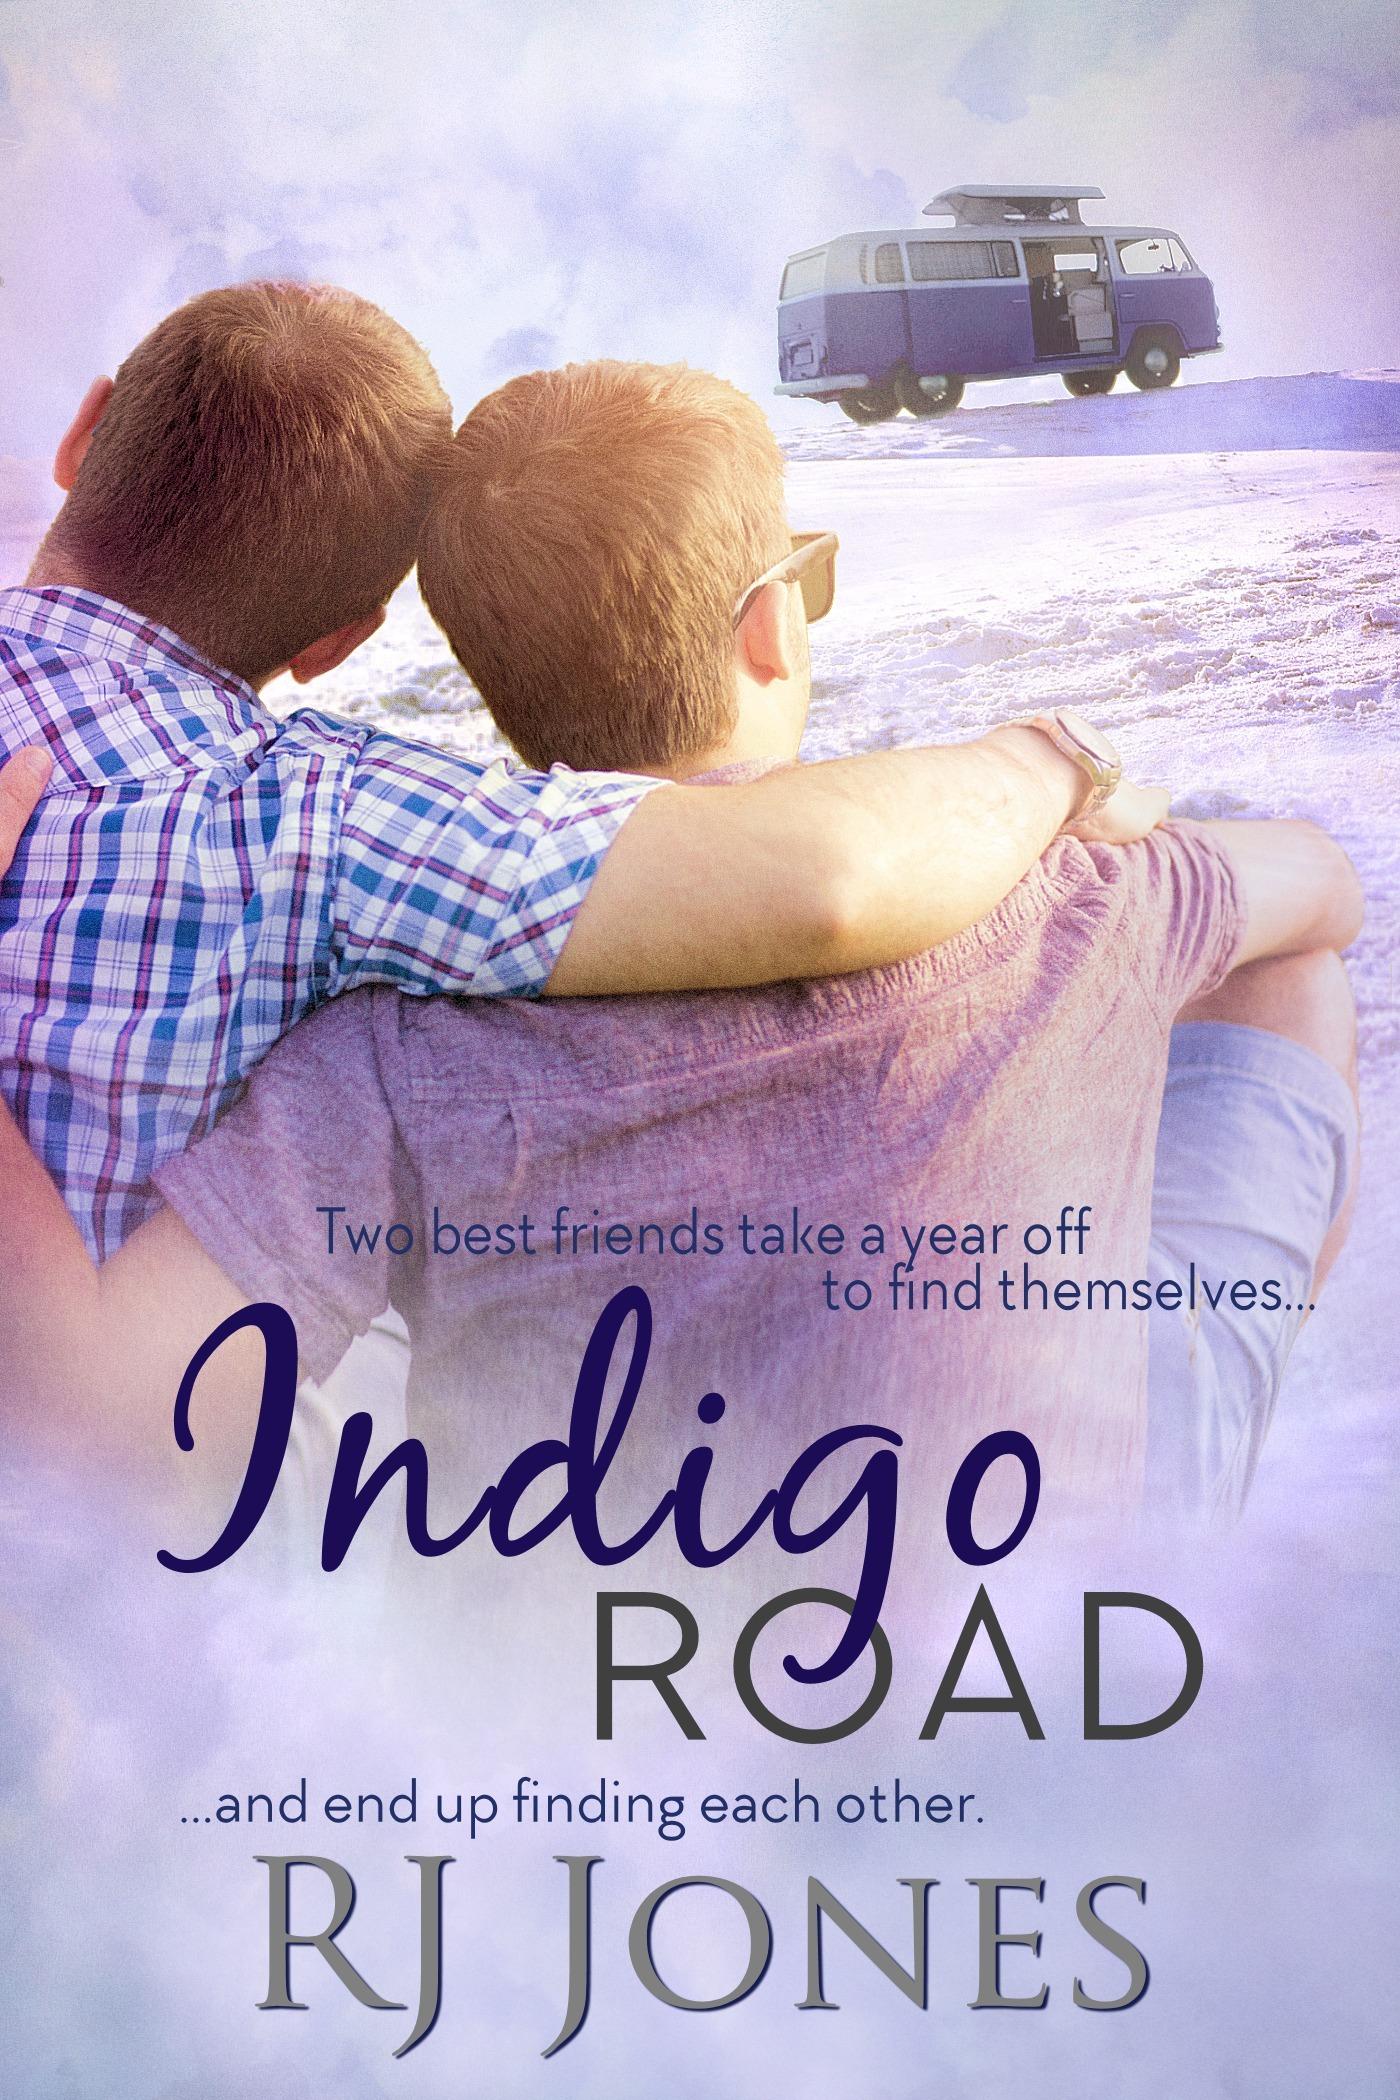 Indigo Road R.J. Jones